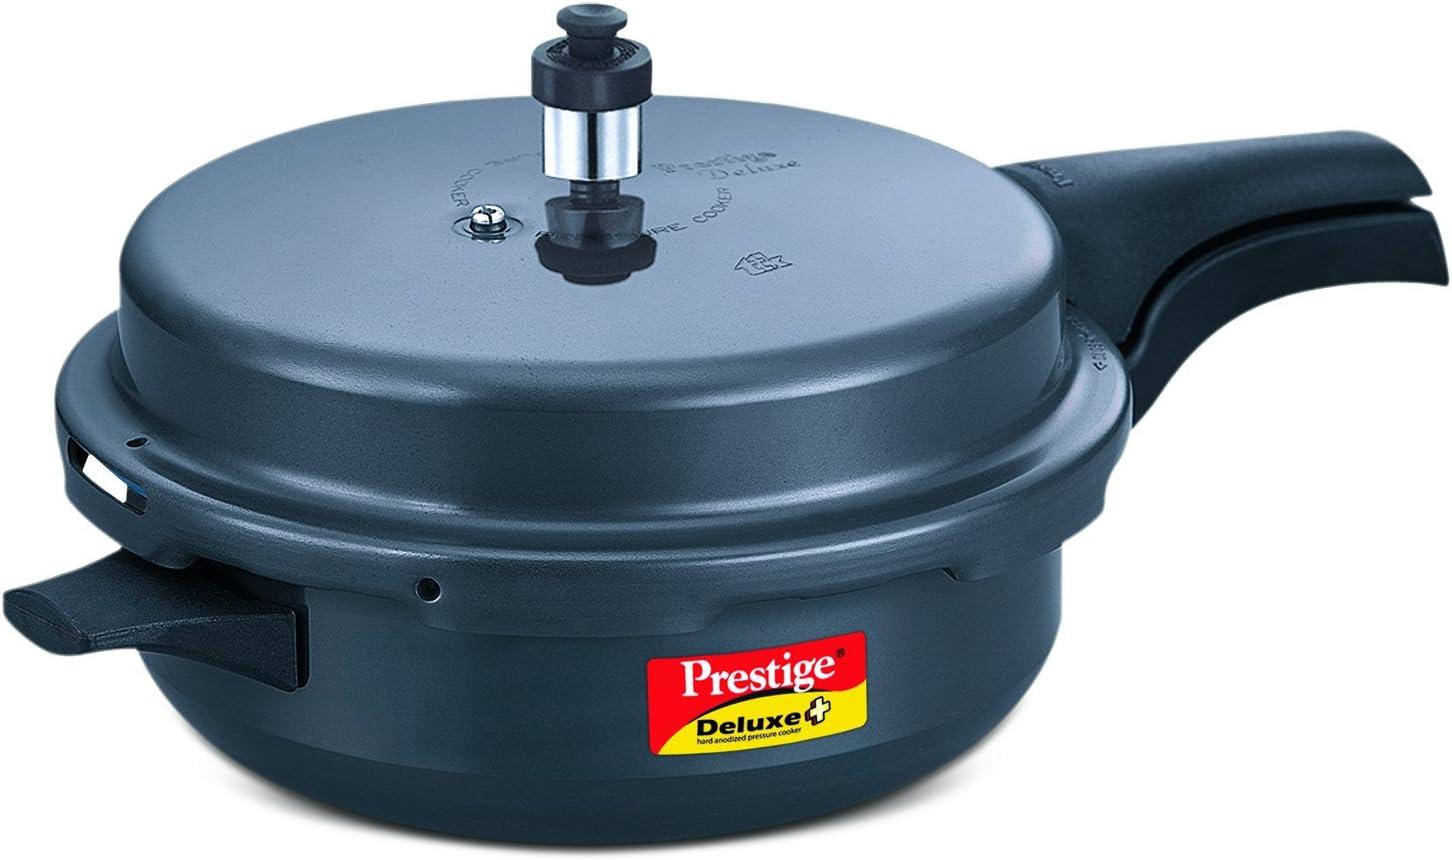 TTK Prestige Deluxe Plus Pressure Cooker, Senior, Dark Grey